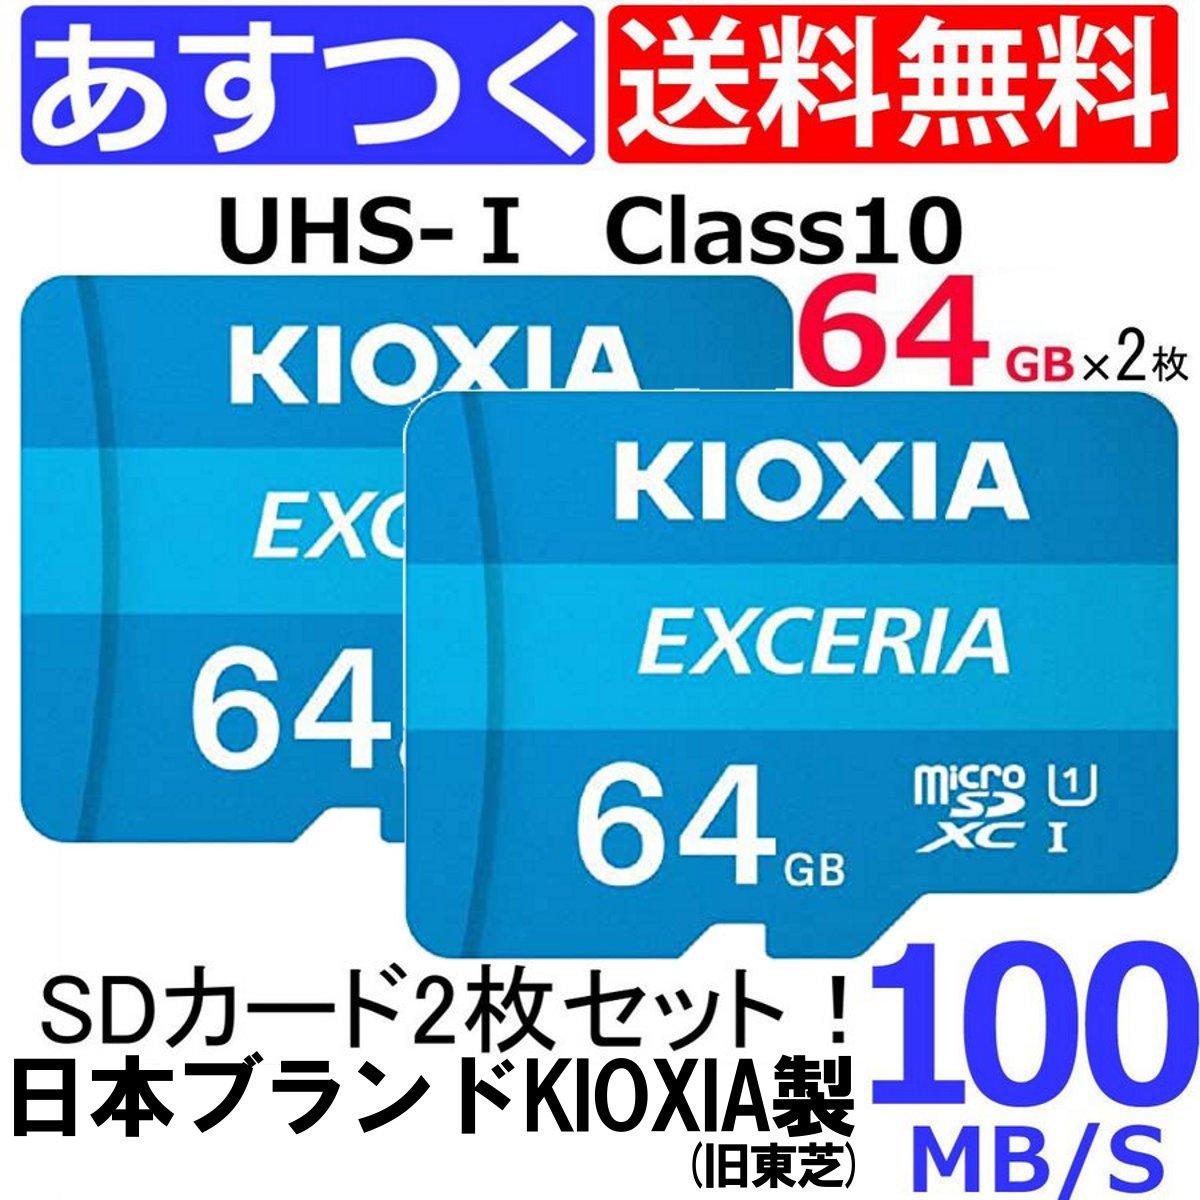 KIOXIA EXCERIA LMEX1L064GG4 (64GB)の商品画像 ナビ